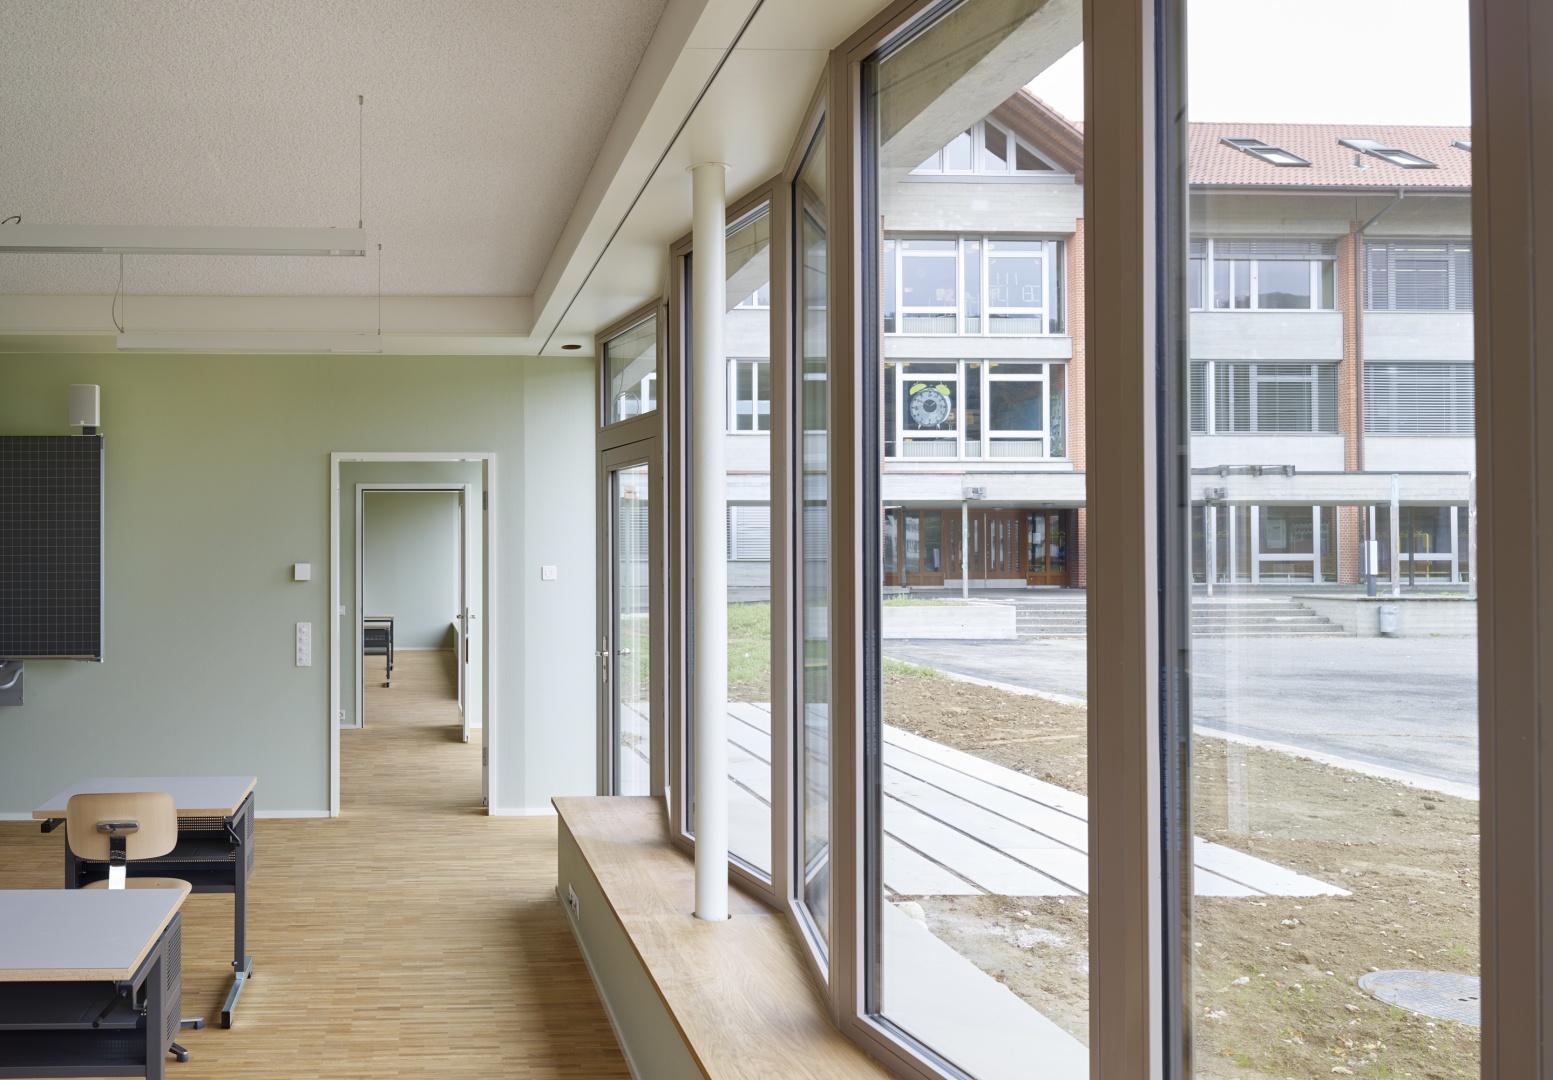 © Michael Fritschi, foto-werk gmbh,  Klingelbergstrasse 97, 4056 Basel